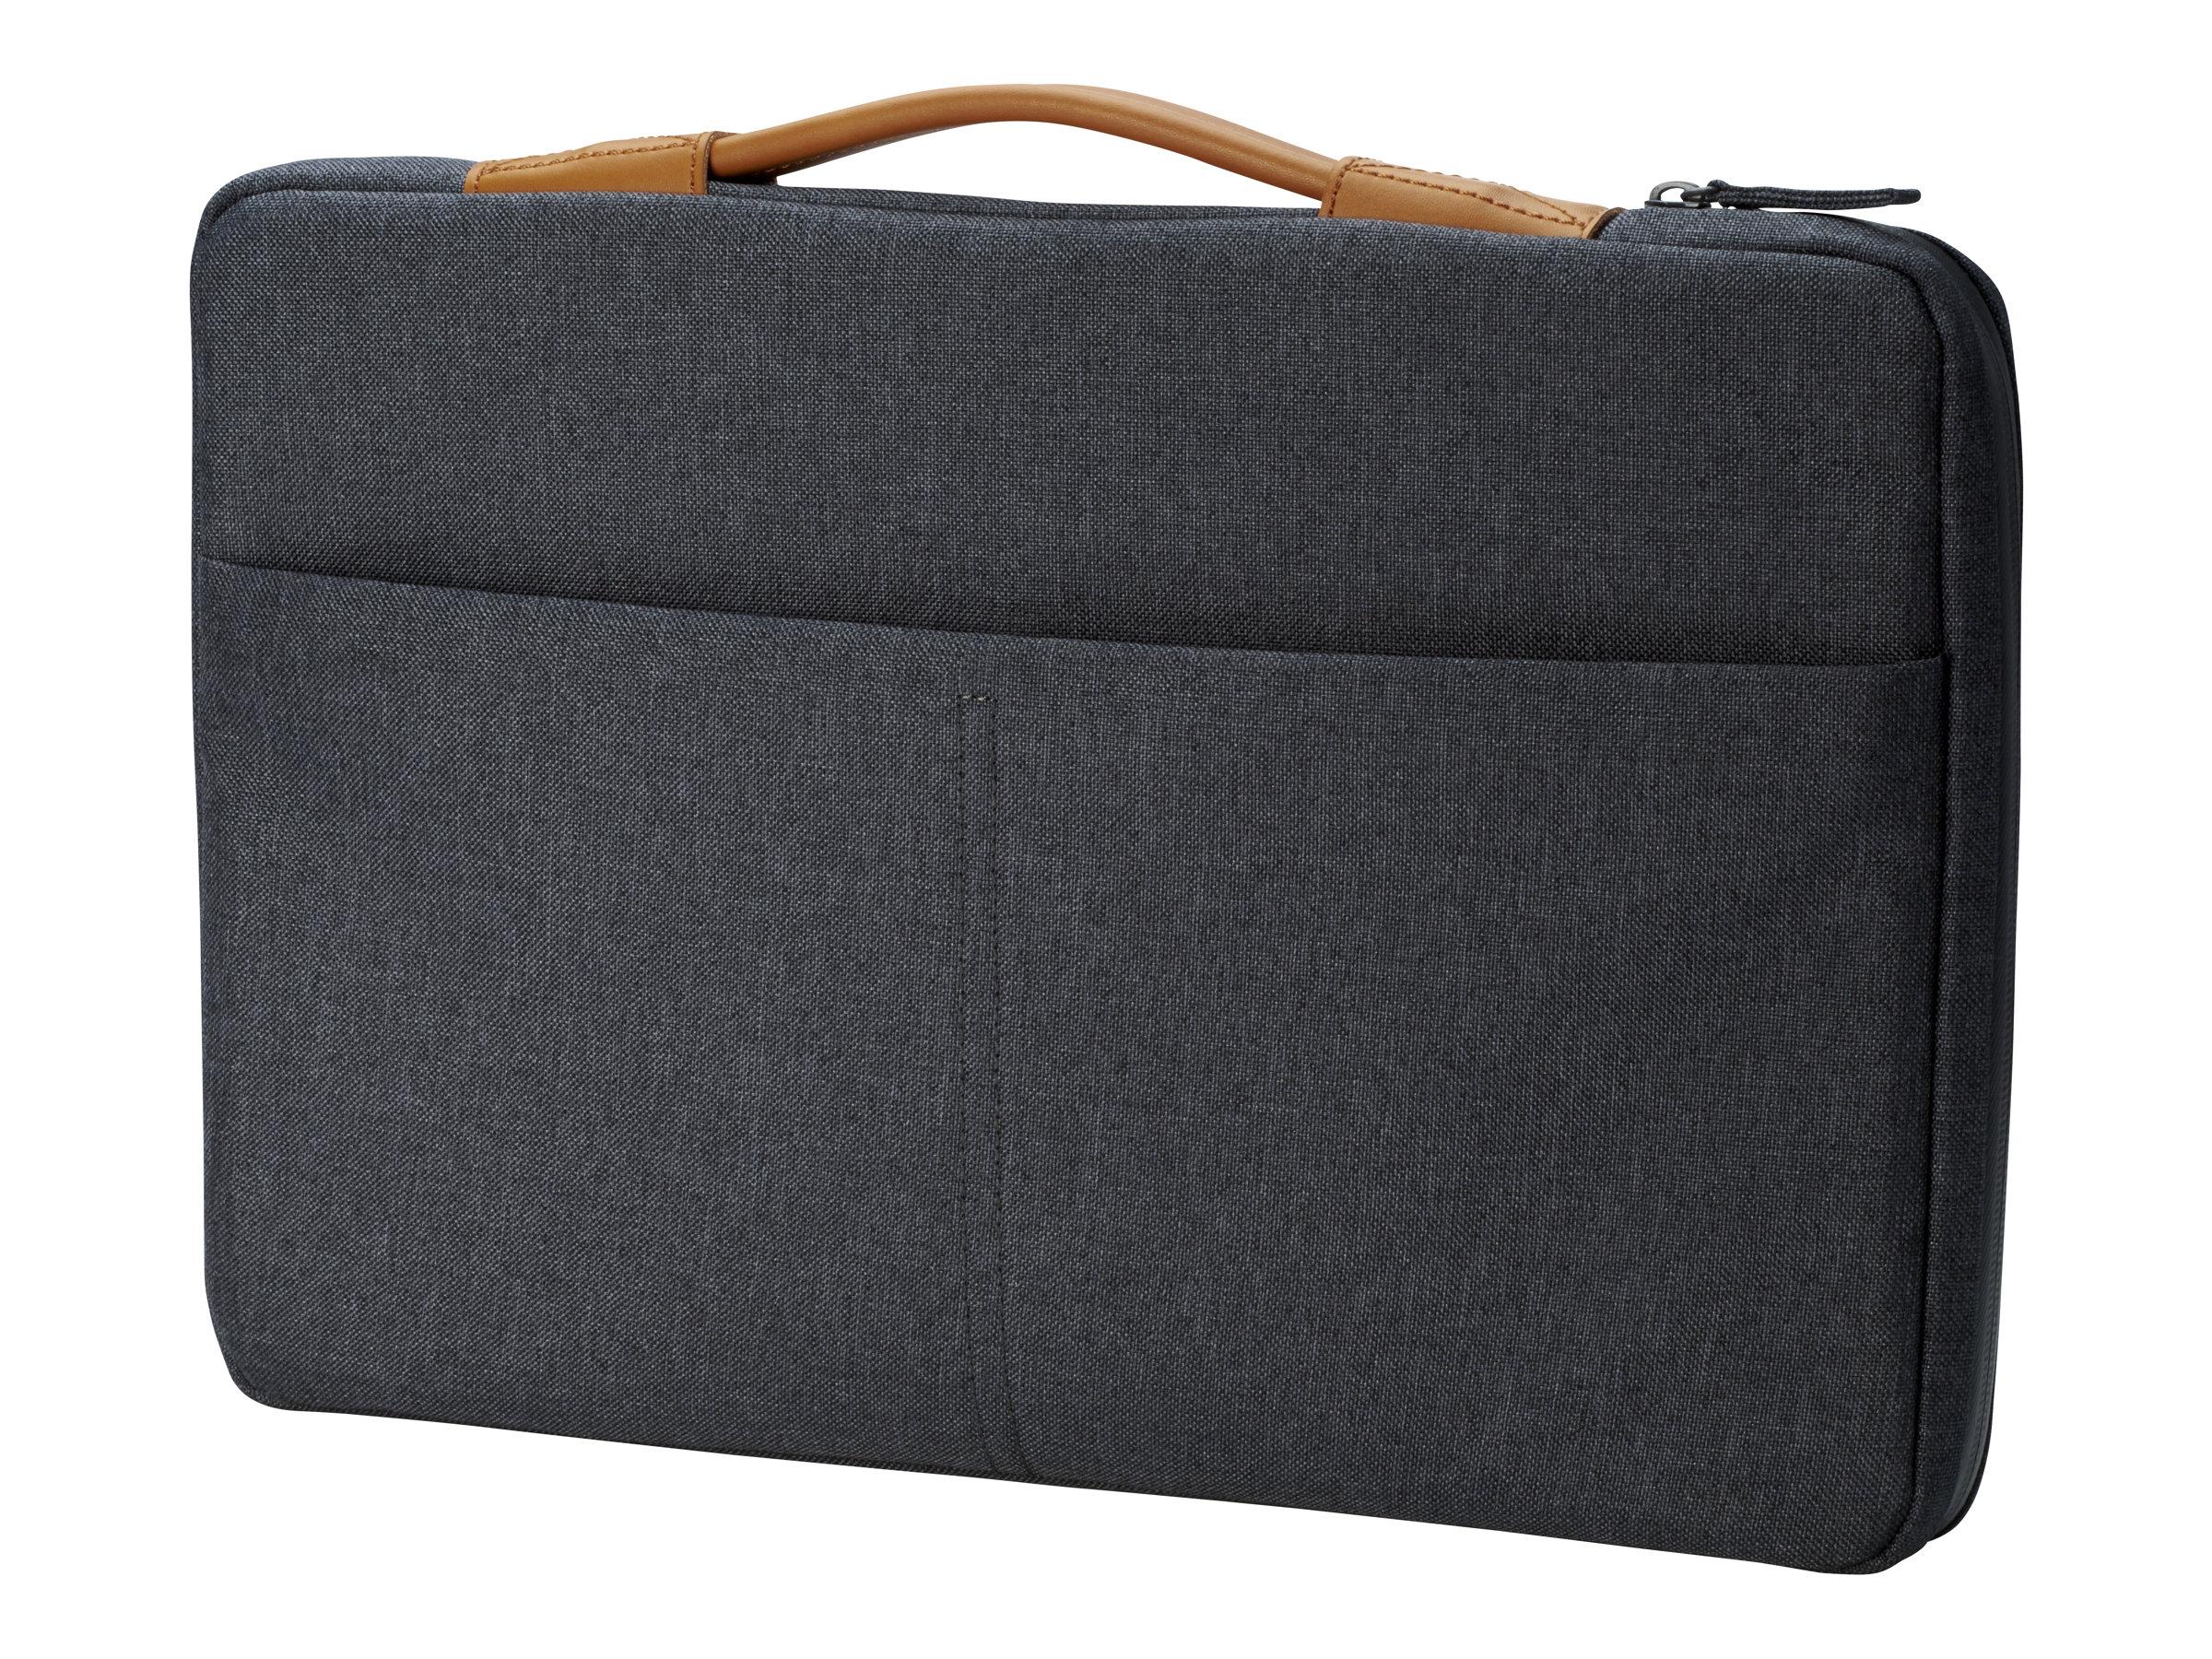 HP ENVY Urban - Notebook-Hülle - 35.6 cm (14